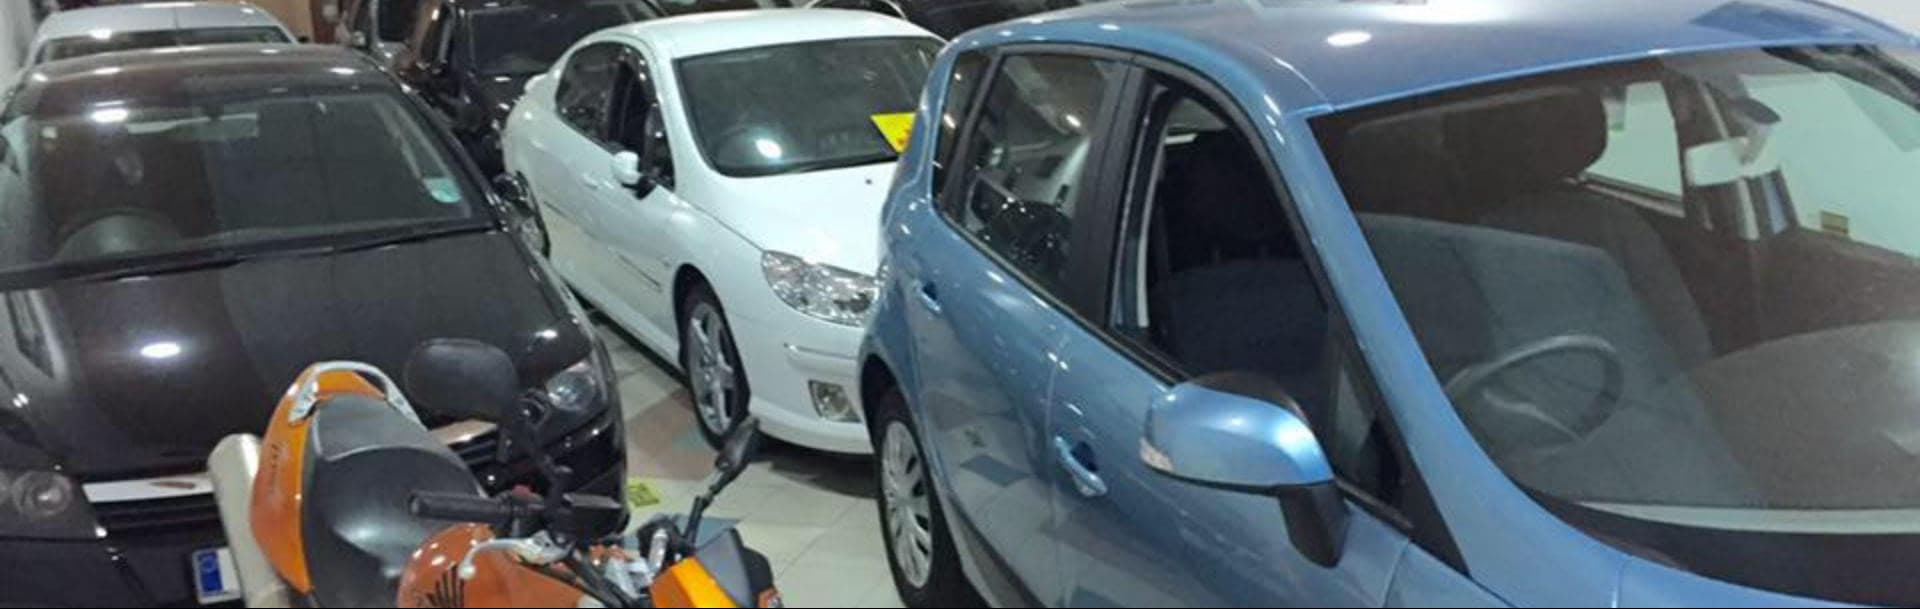 Sonic Auto Dealer - Motor Vehicle Importers in B'Kara, Malta